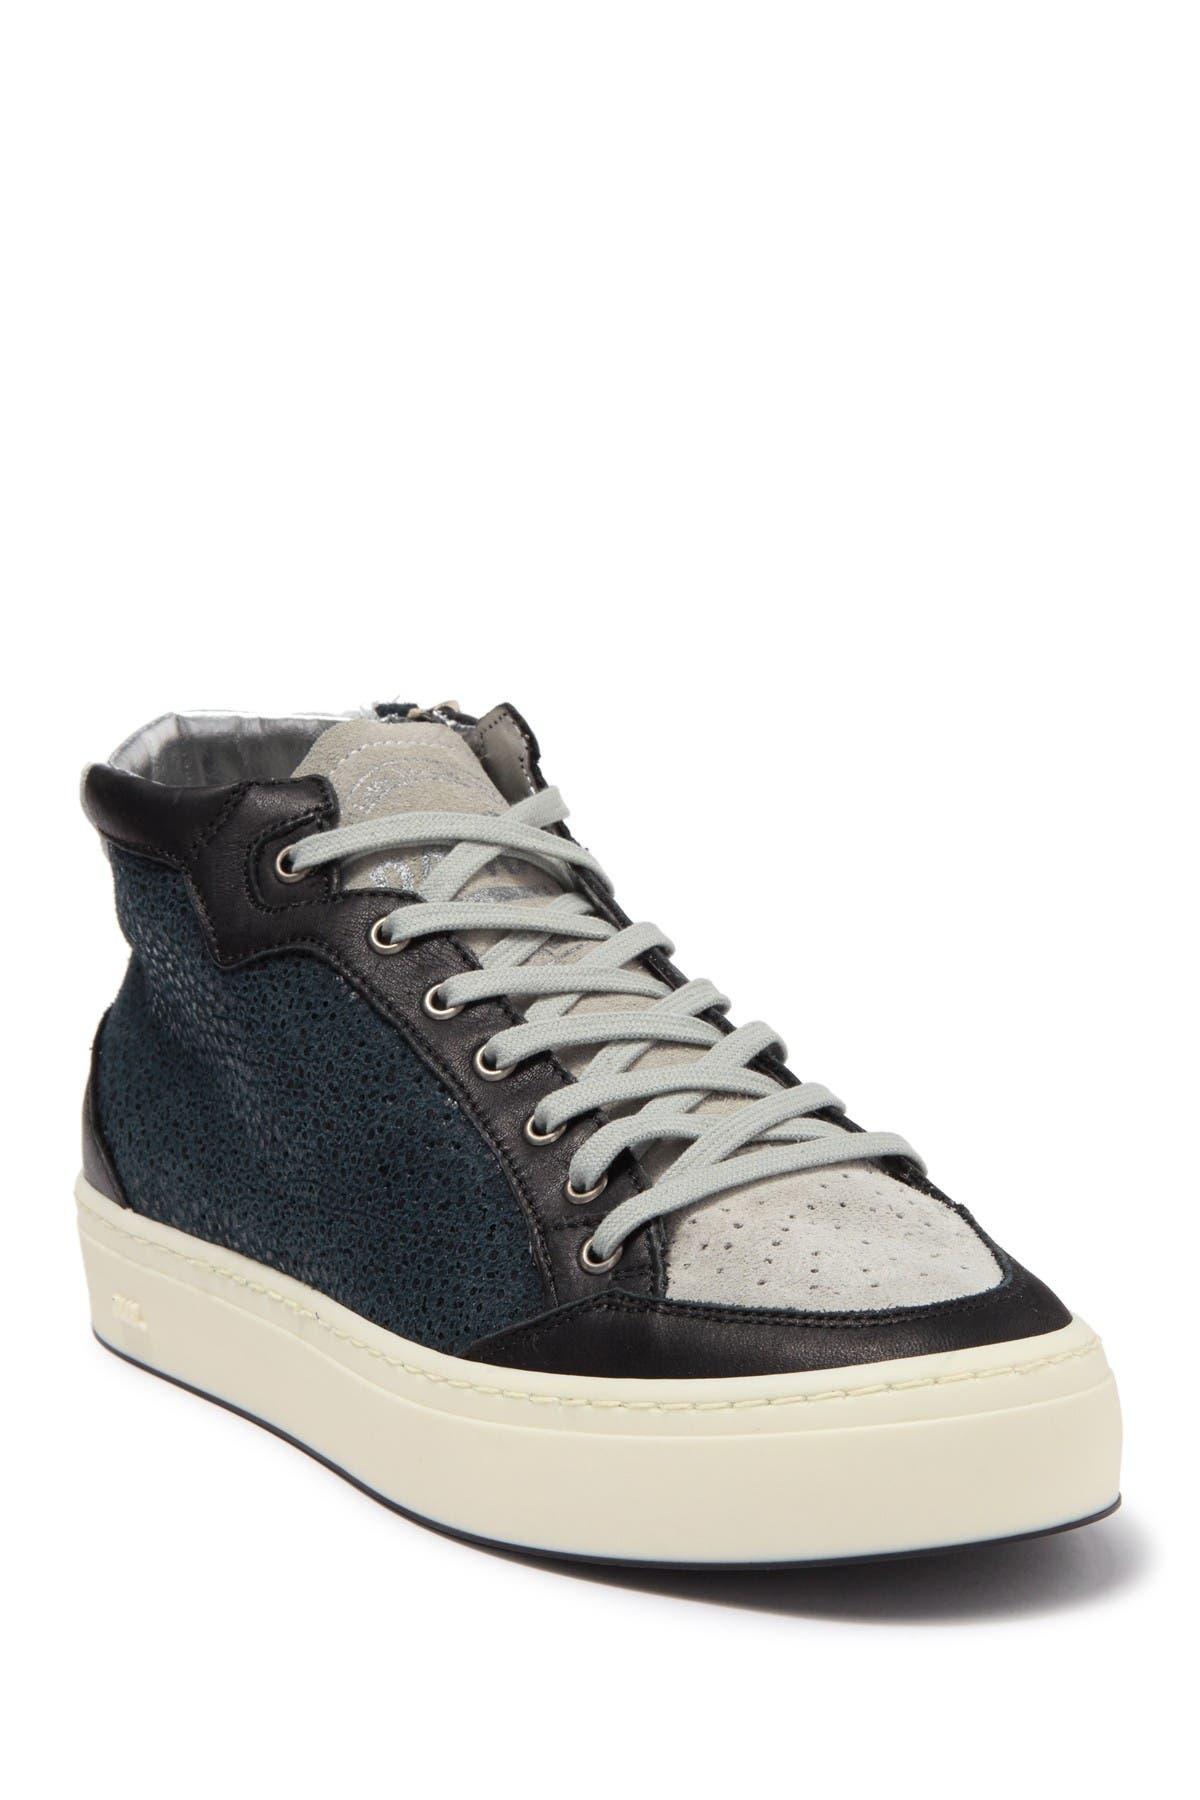 P448 | F9 Love 410 High-Top Sneaker